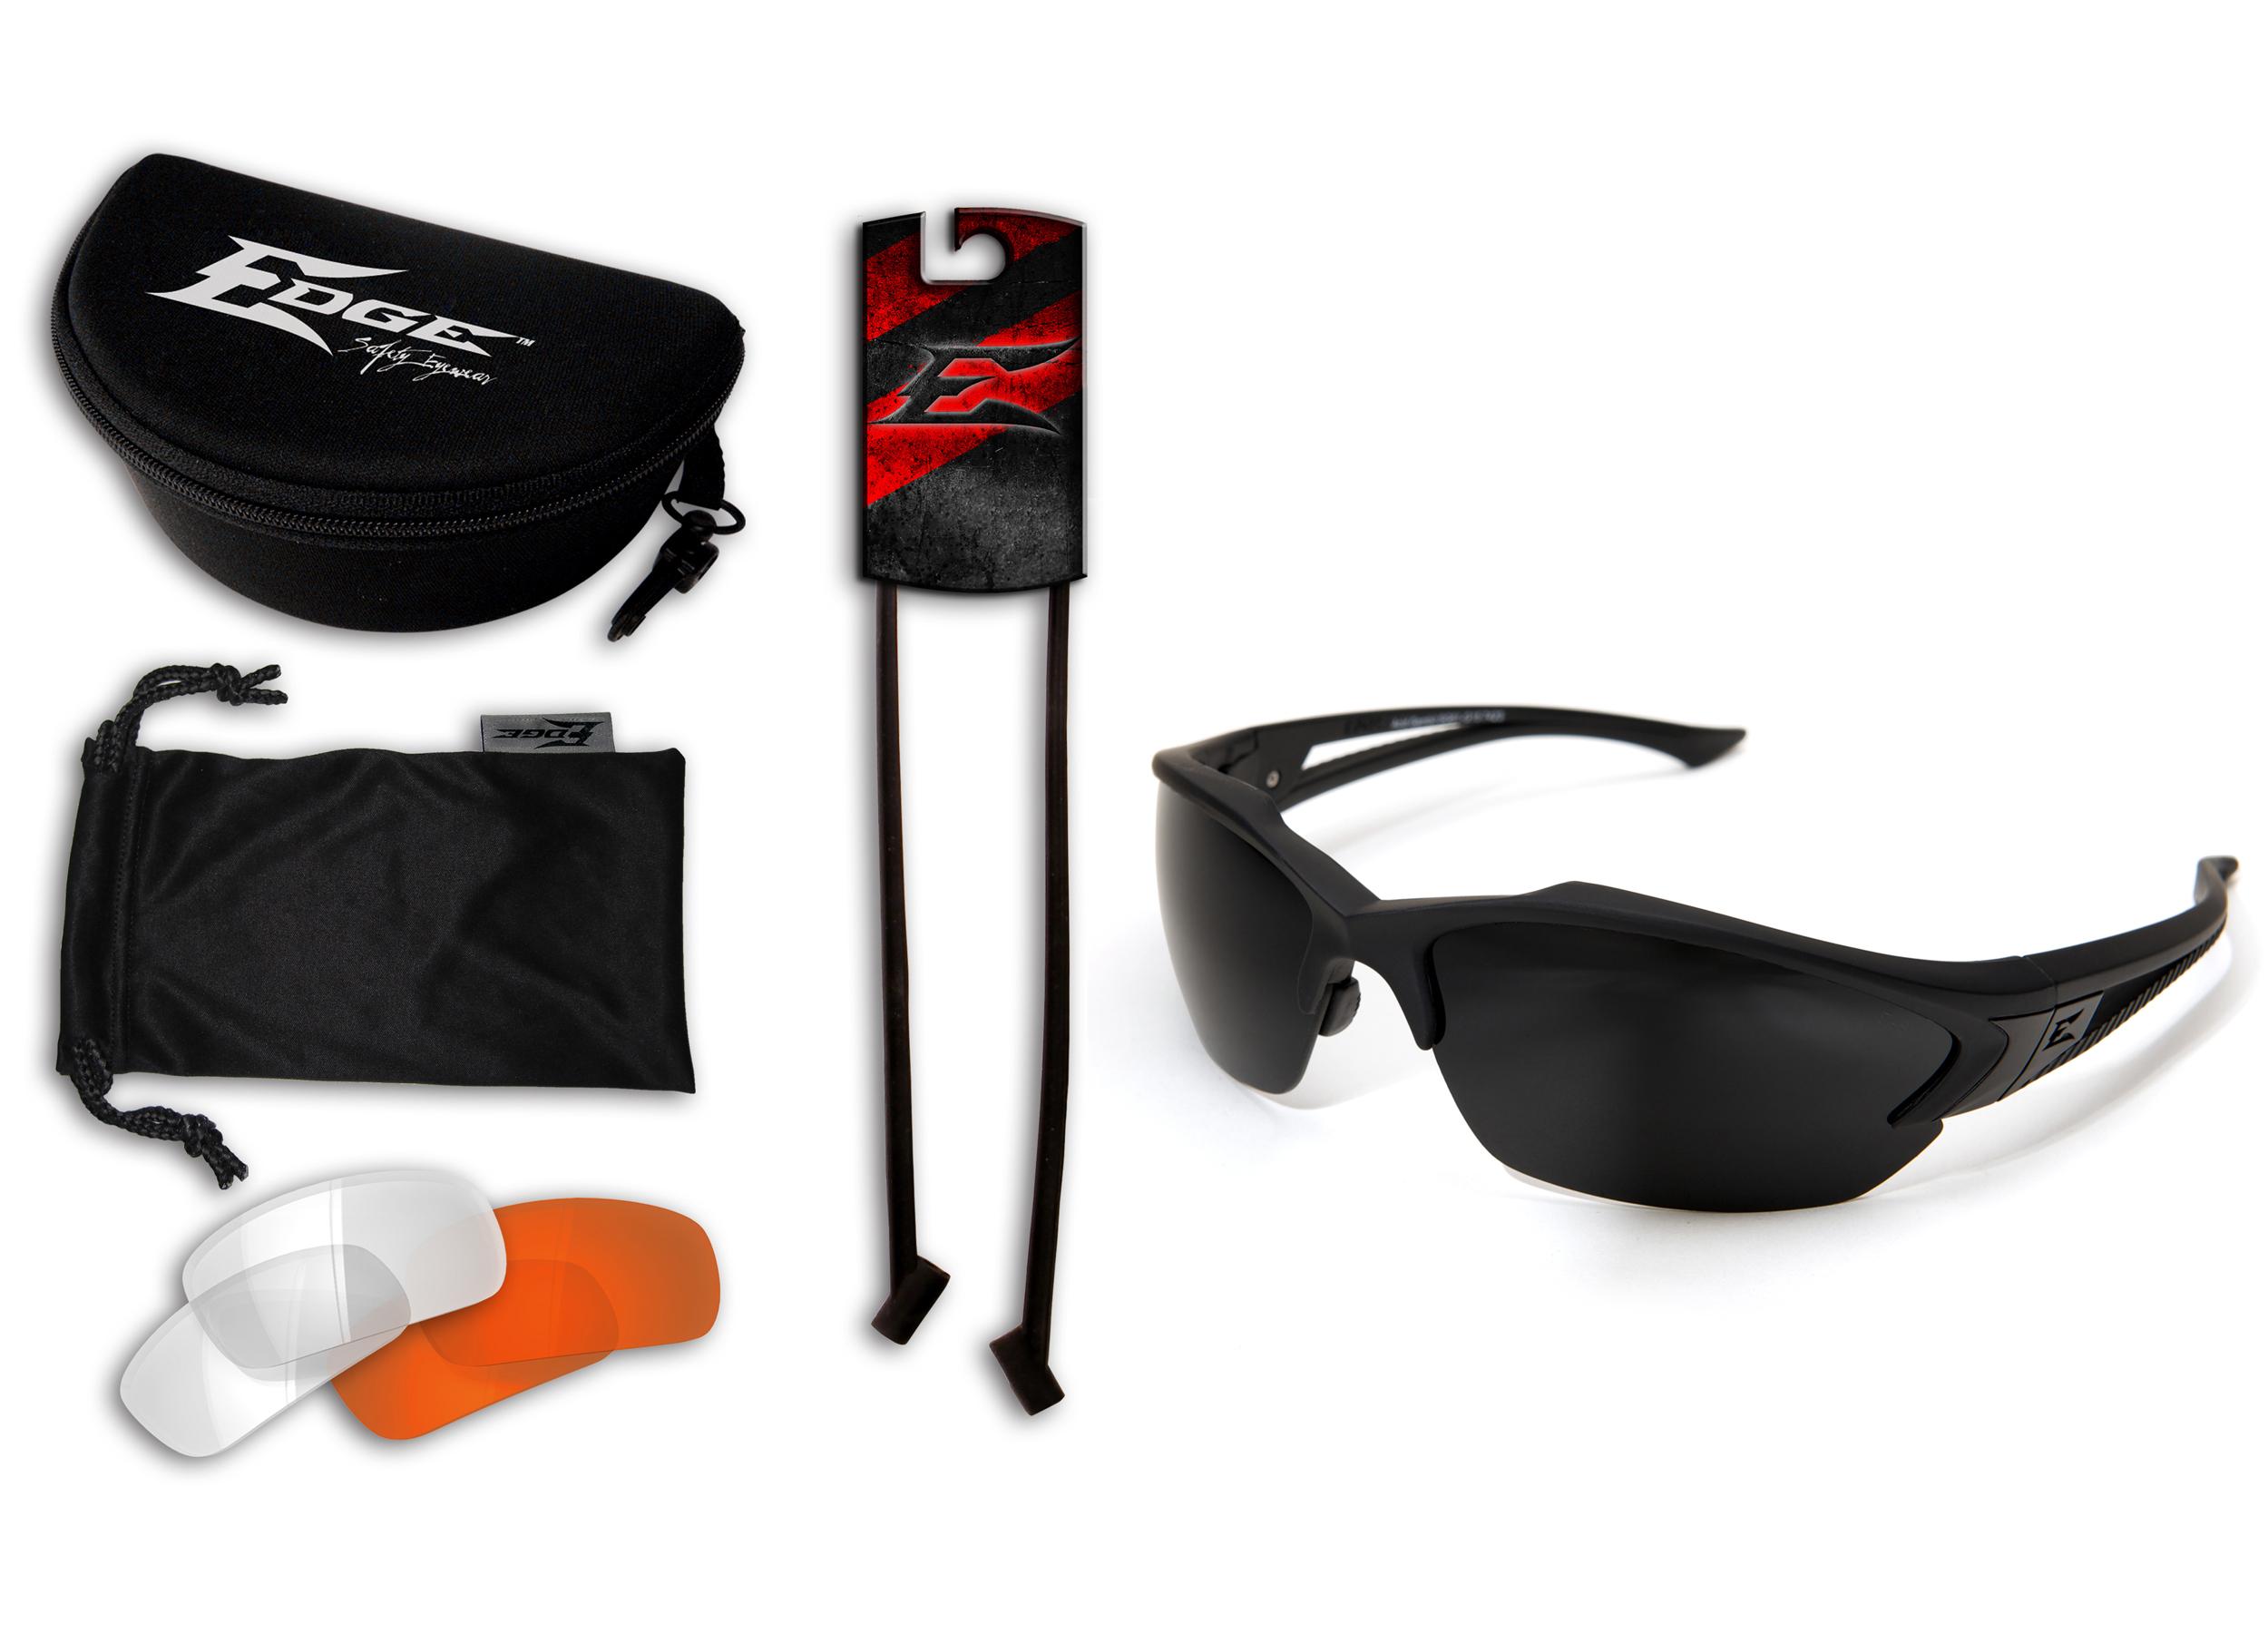 Edge Eyewear Blade Runner Glasses Matte Black Frame with Gasket//Clear Shield Lens